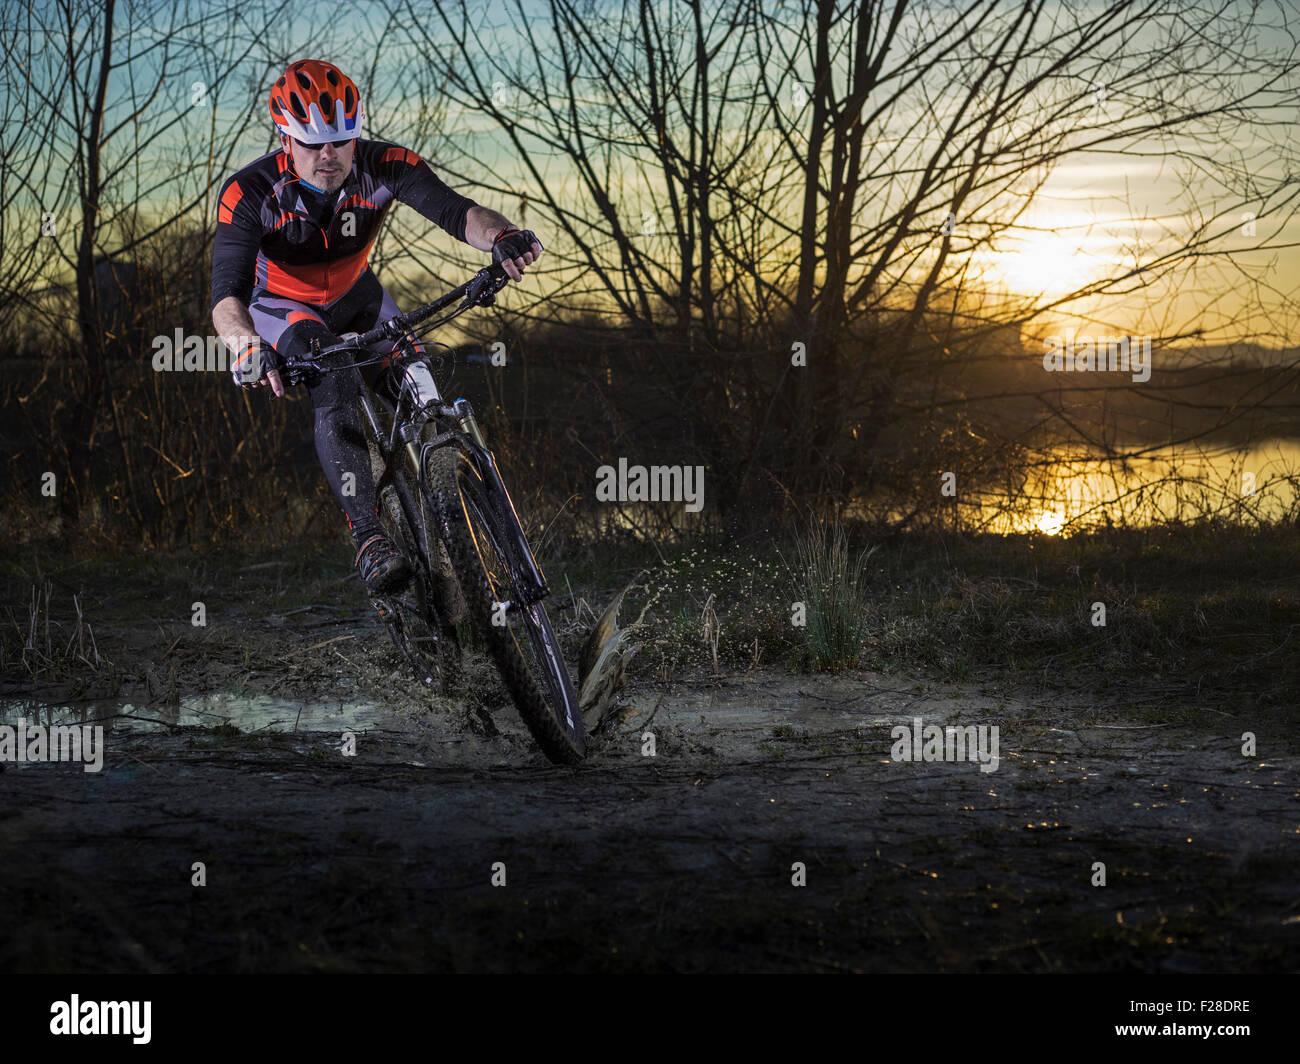 Mature man riding mountain bike on dirt track, Bavaria, Germany Stock Photo